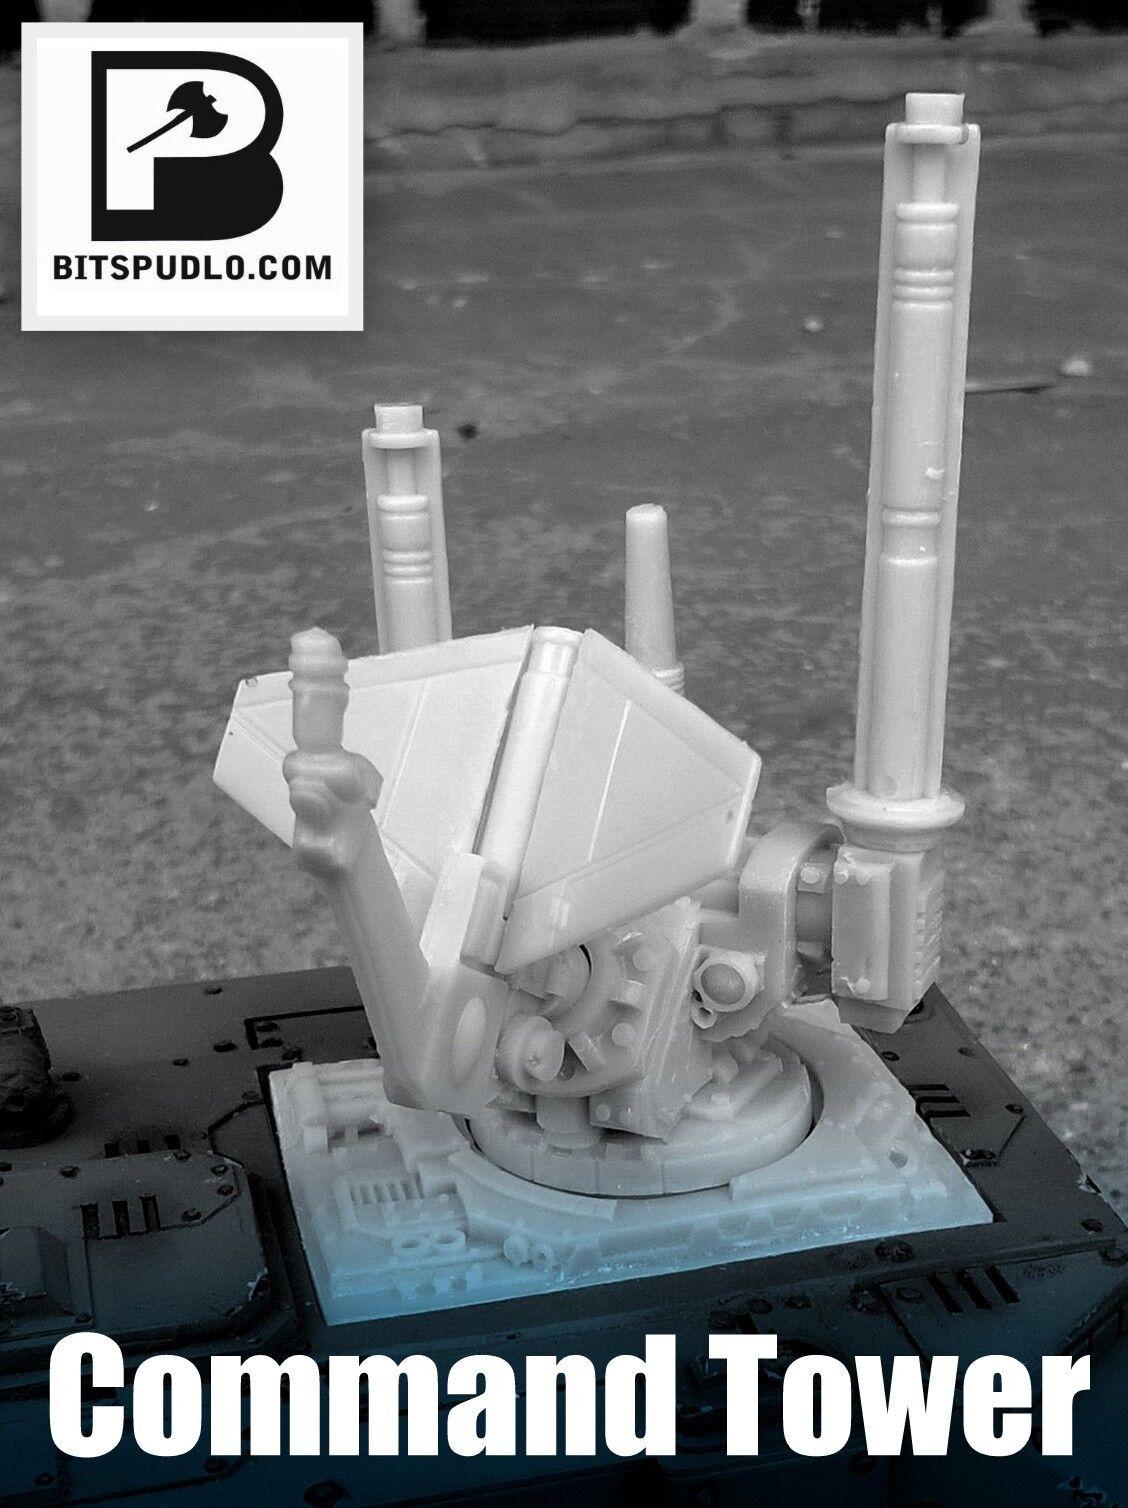 Alternative Damocles Command Rhino turret for Space Marines